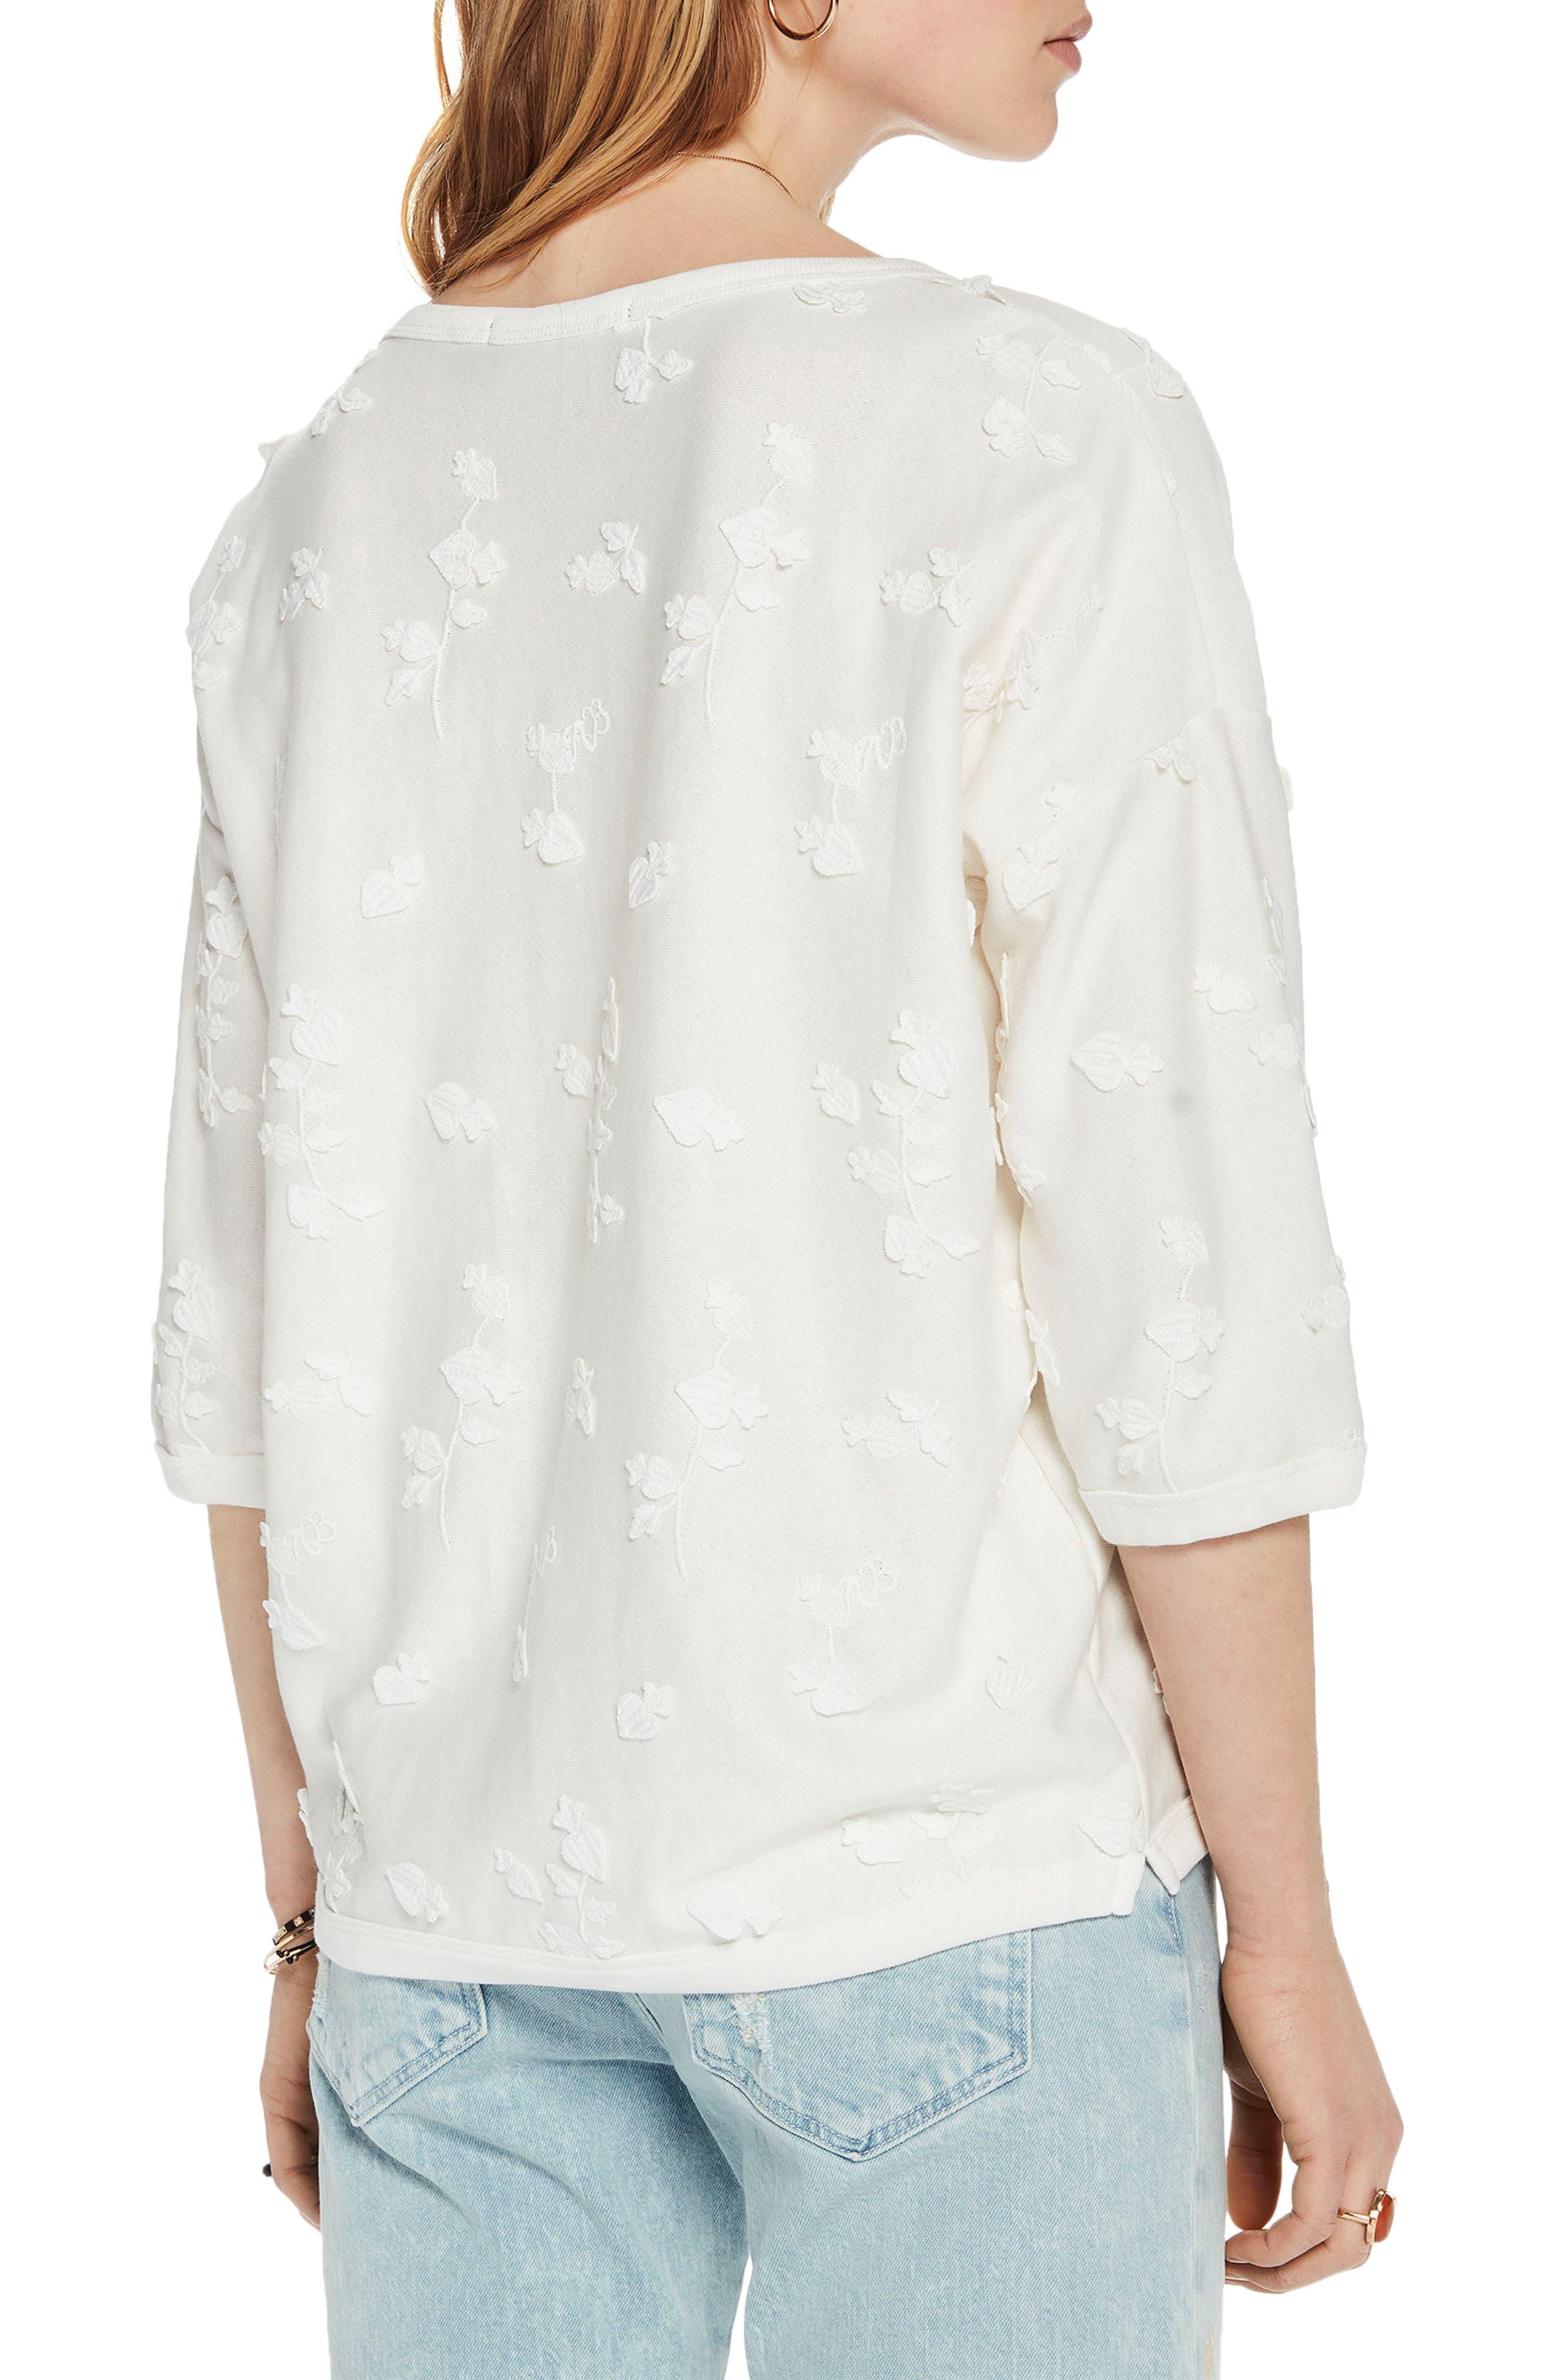 Tonal Embroidered Sweatshirt,                             Alternate thumbnail 2, color,                             01 Denim White